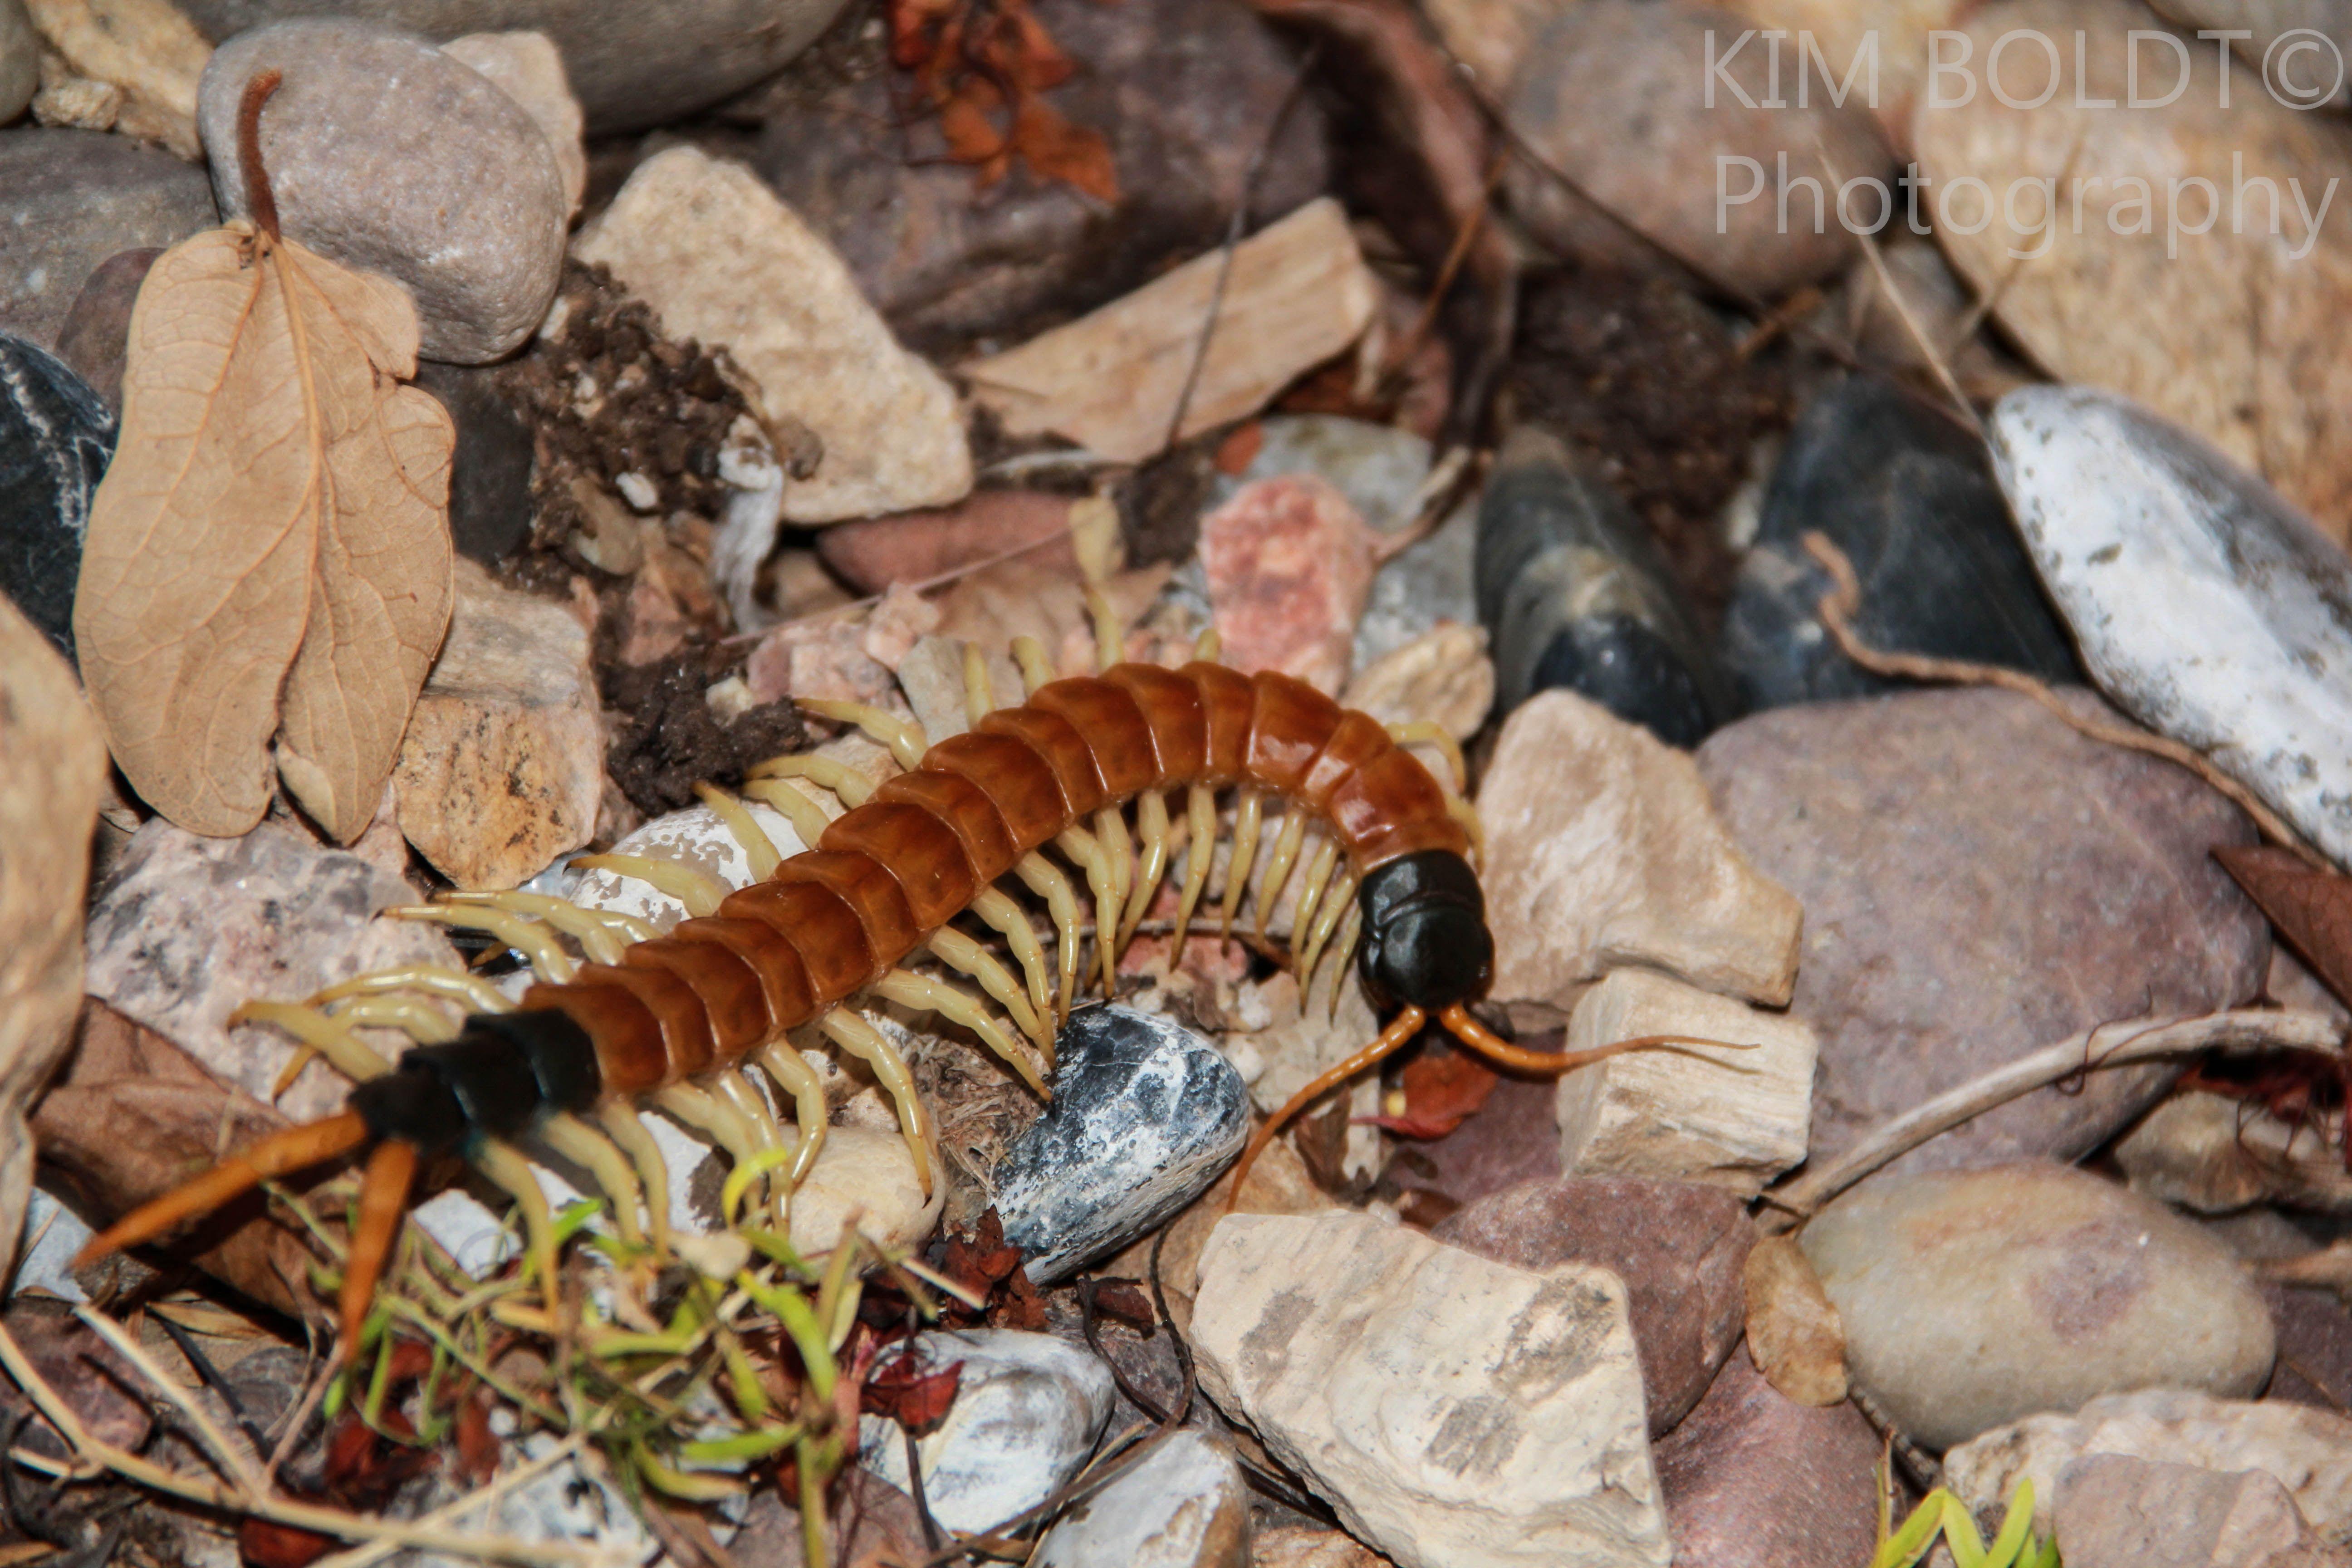 Giant Desert Centipede Tucson Wildlife Tucson Reptiles Arizona